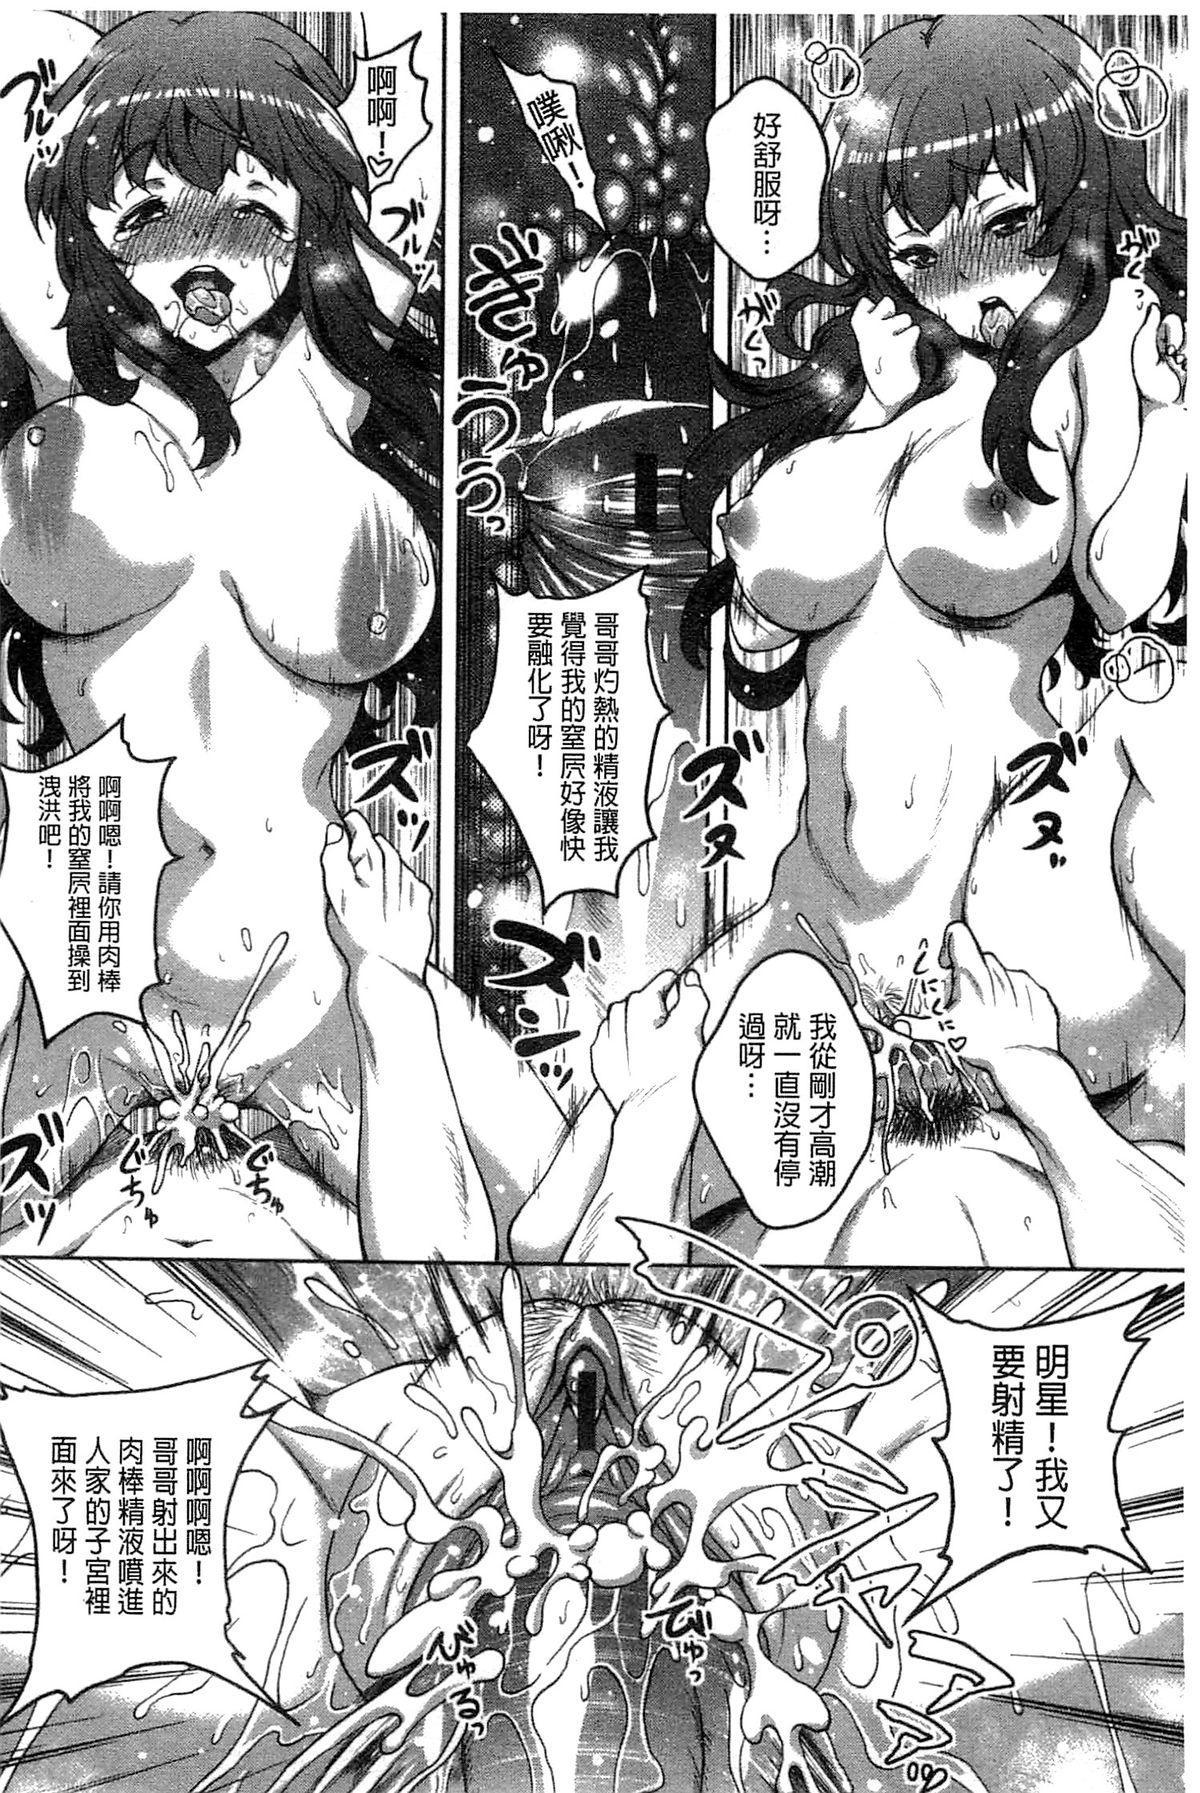 Hajimete nan dakara - First sexual experience 146